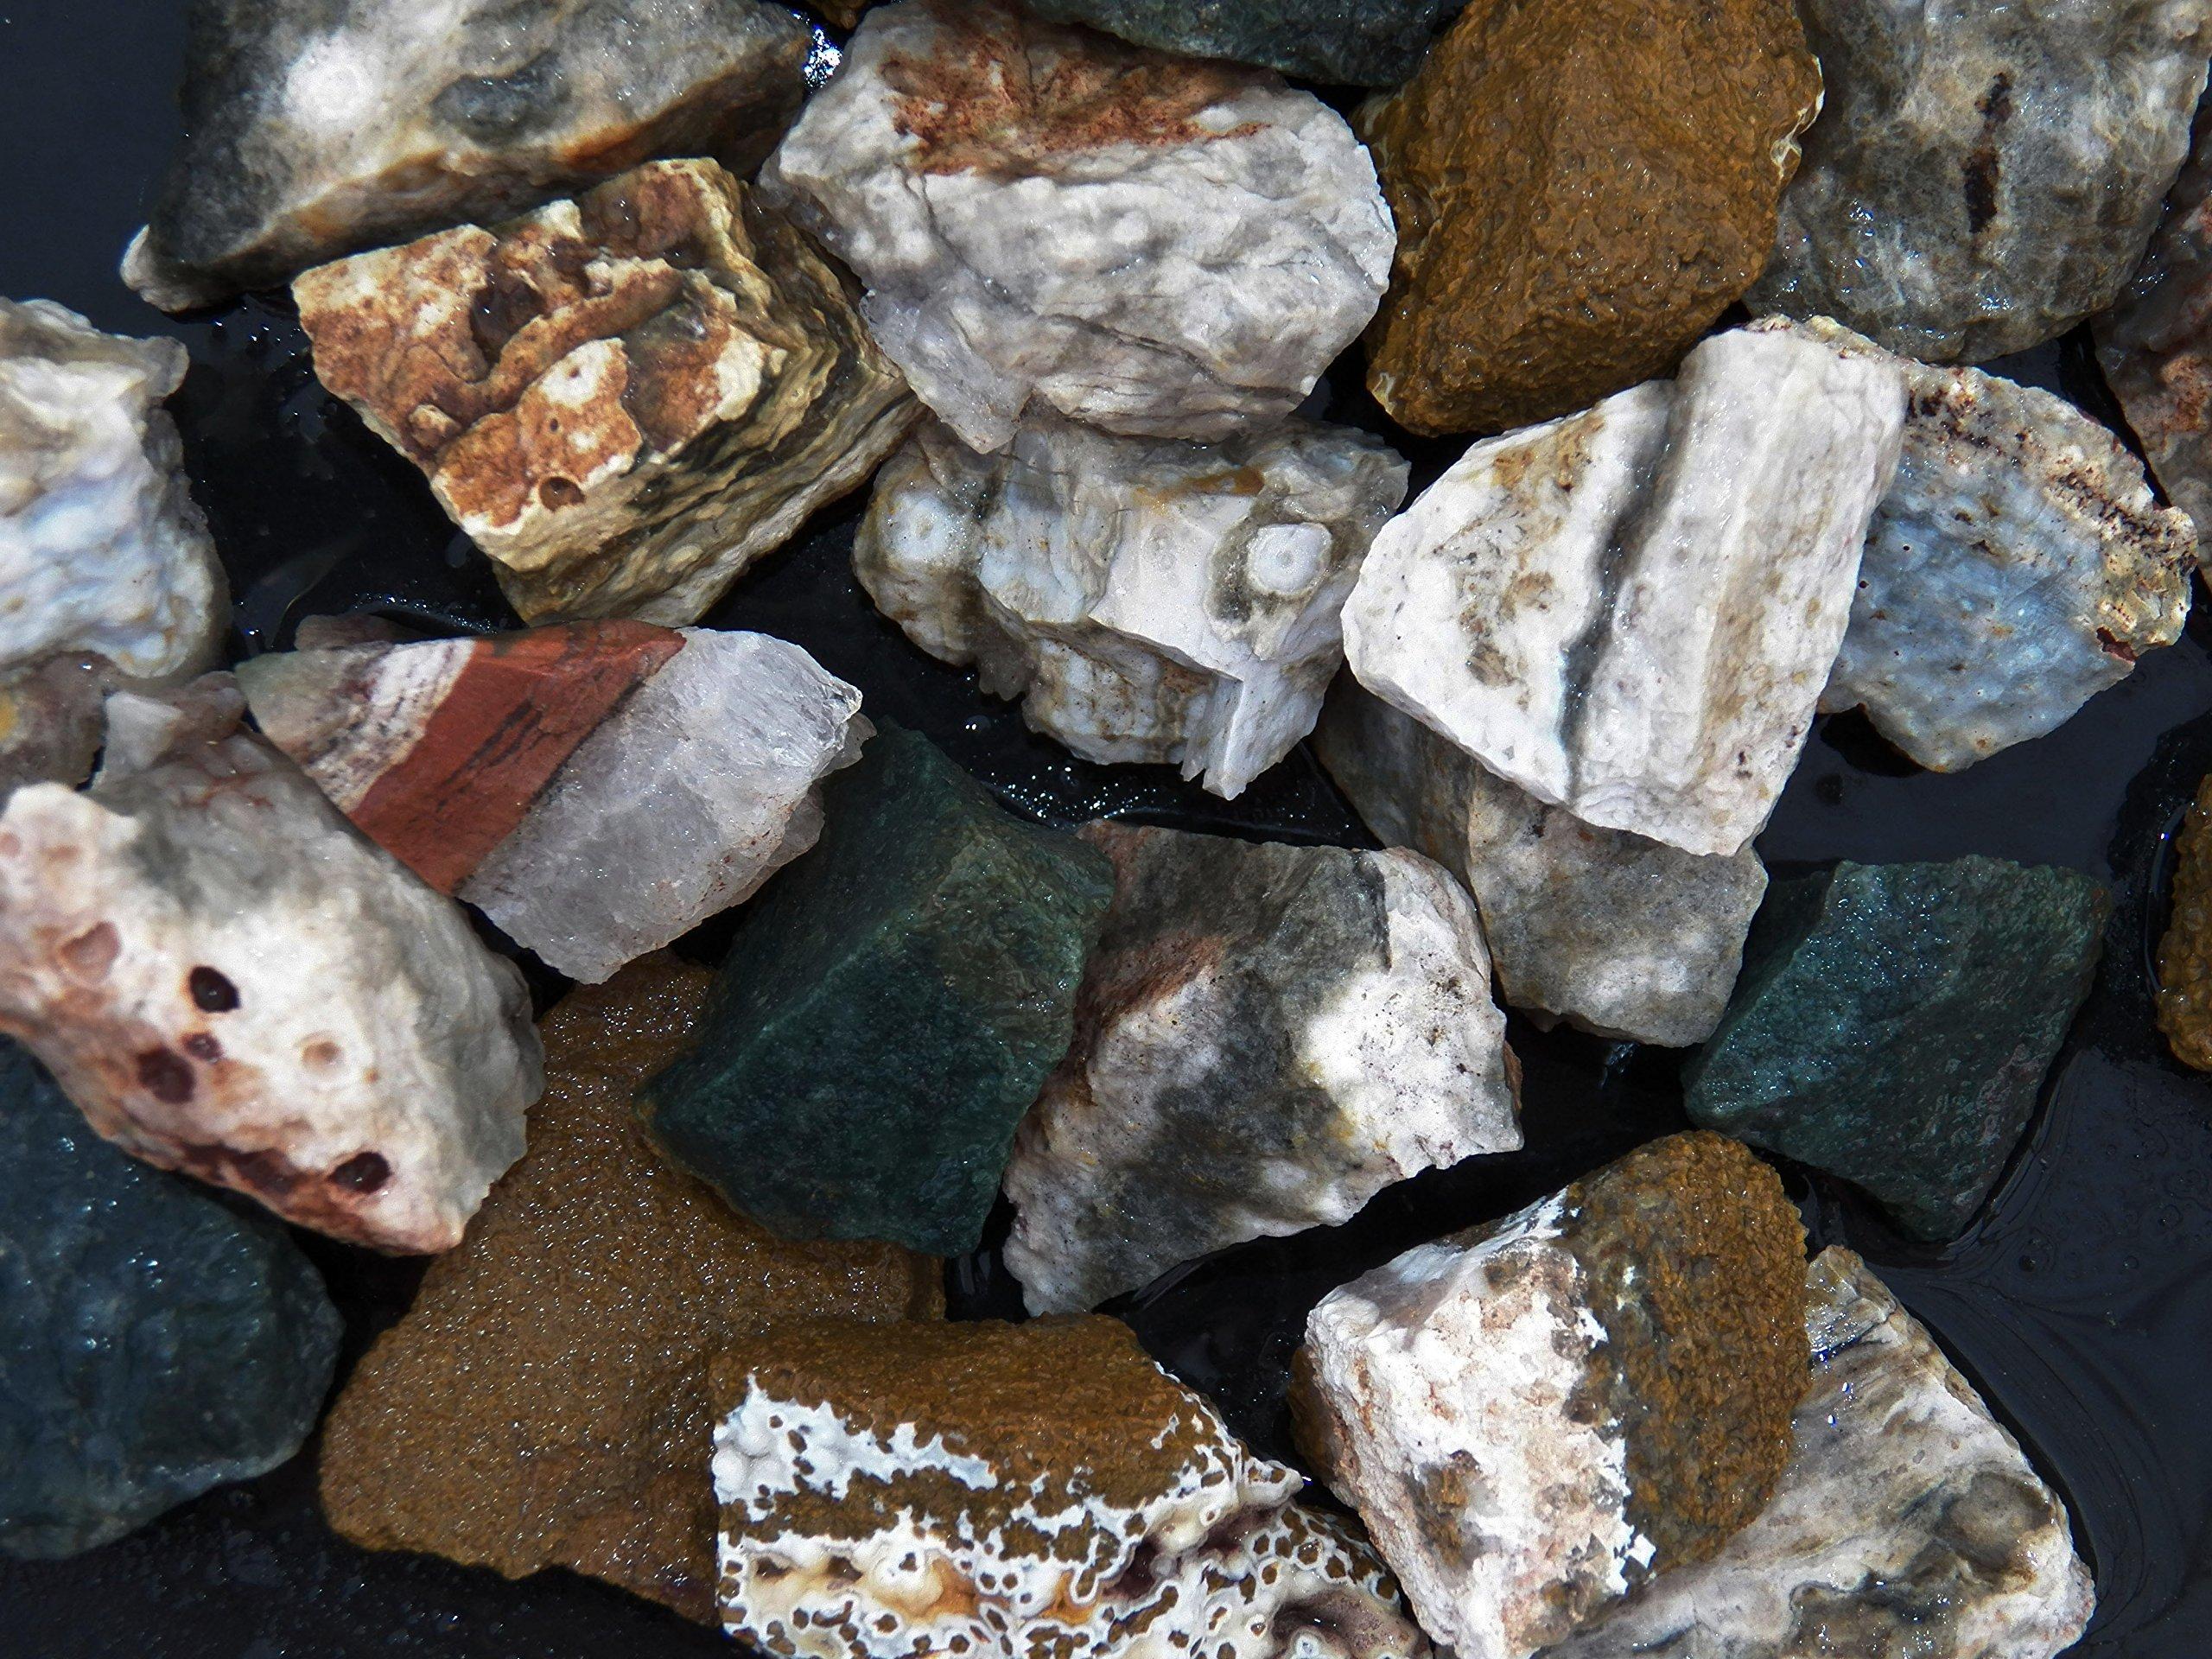 Fundamental Rockhound Products: Rough Ocean Jasper Bulk Rock for Tumbling, Metaphysical Use, Gemstones Healing Crystals Wholesale Lot from Madagascar (11 lb)